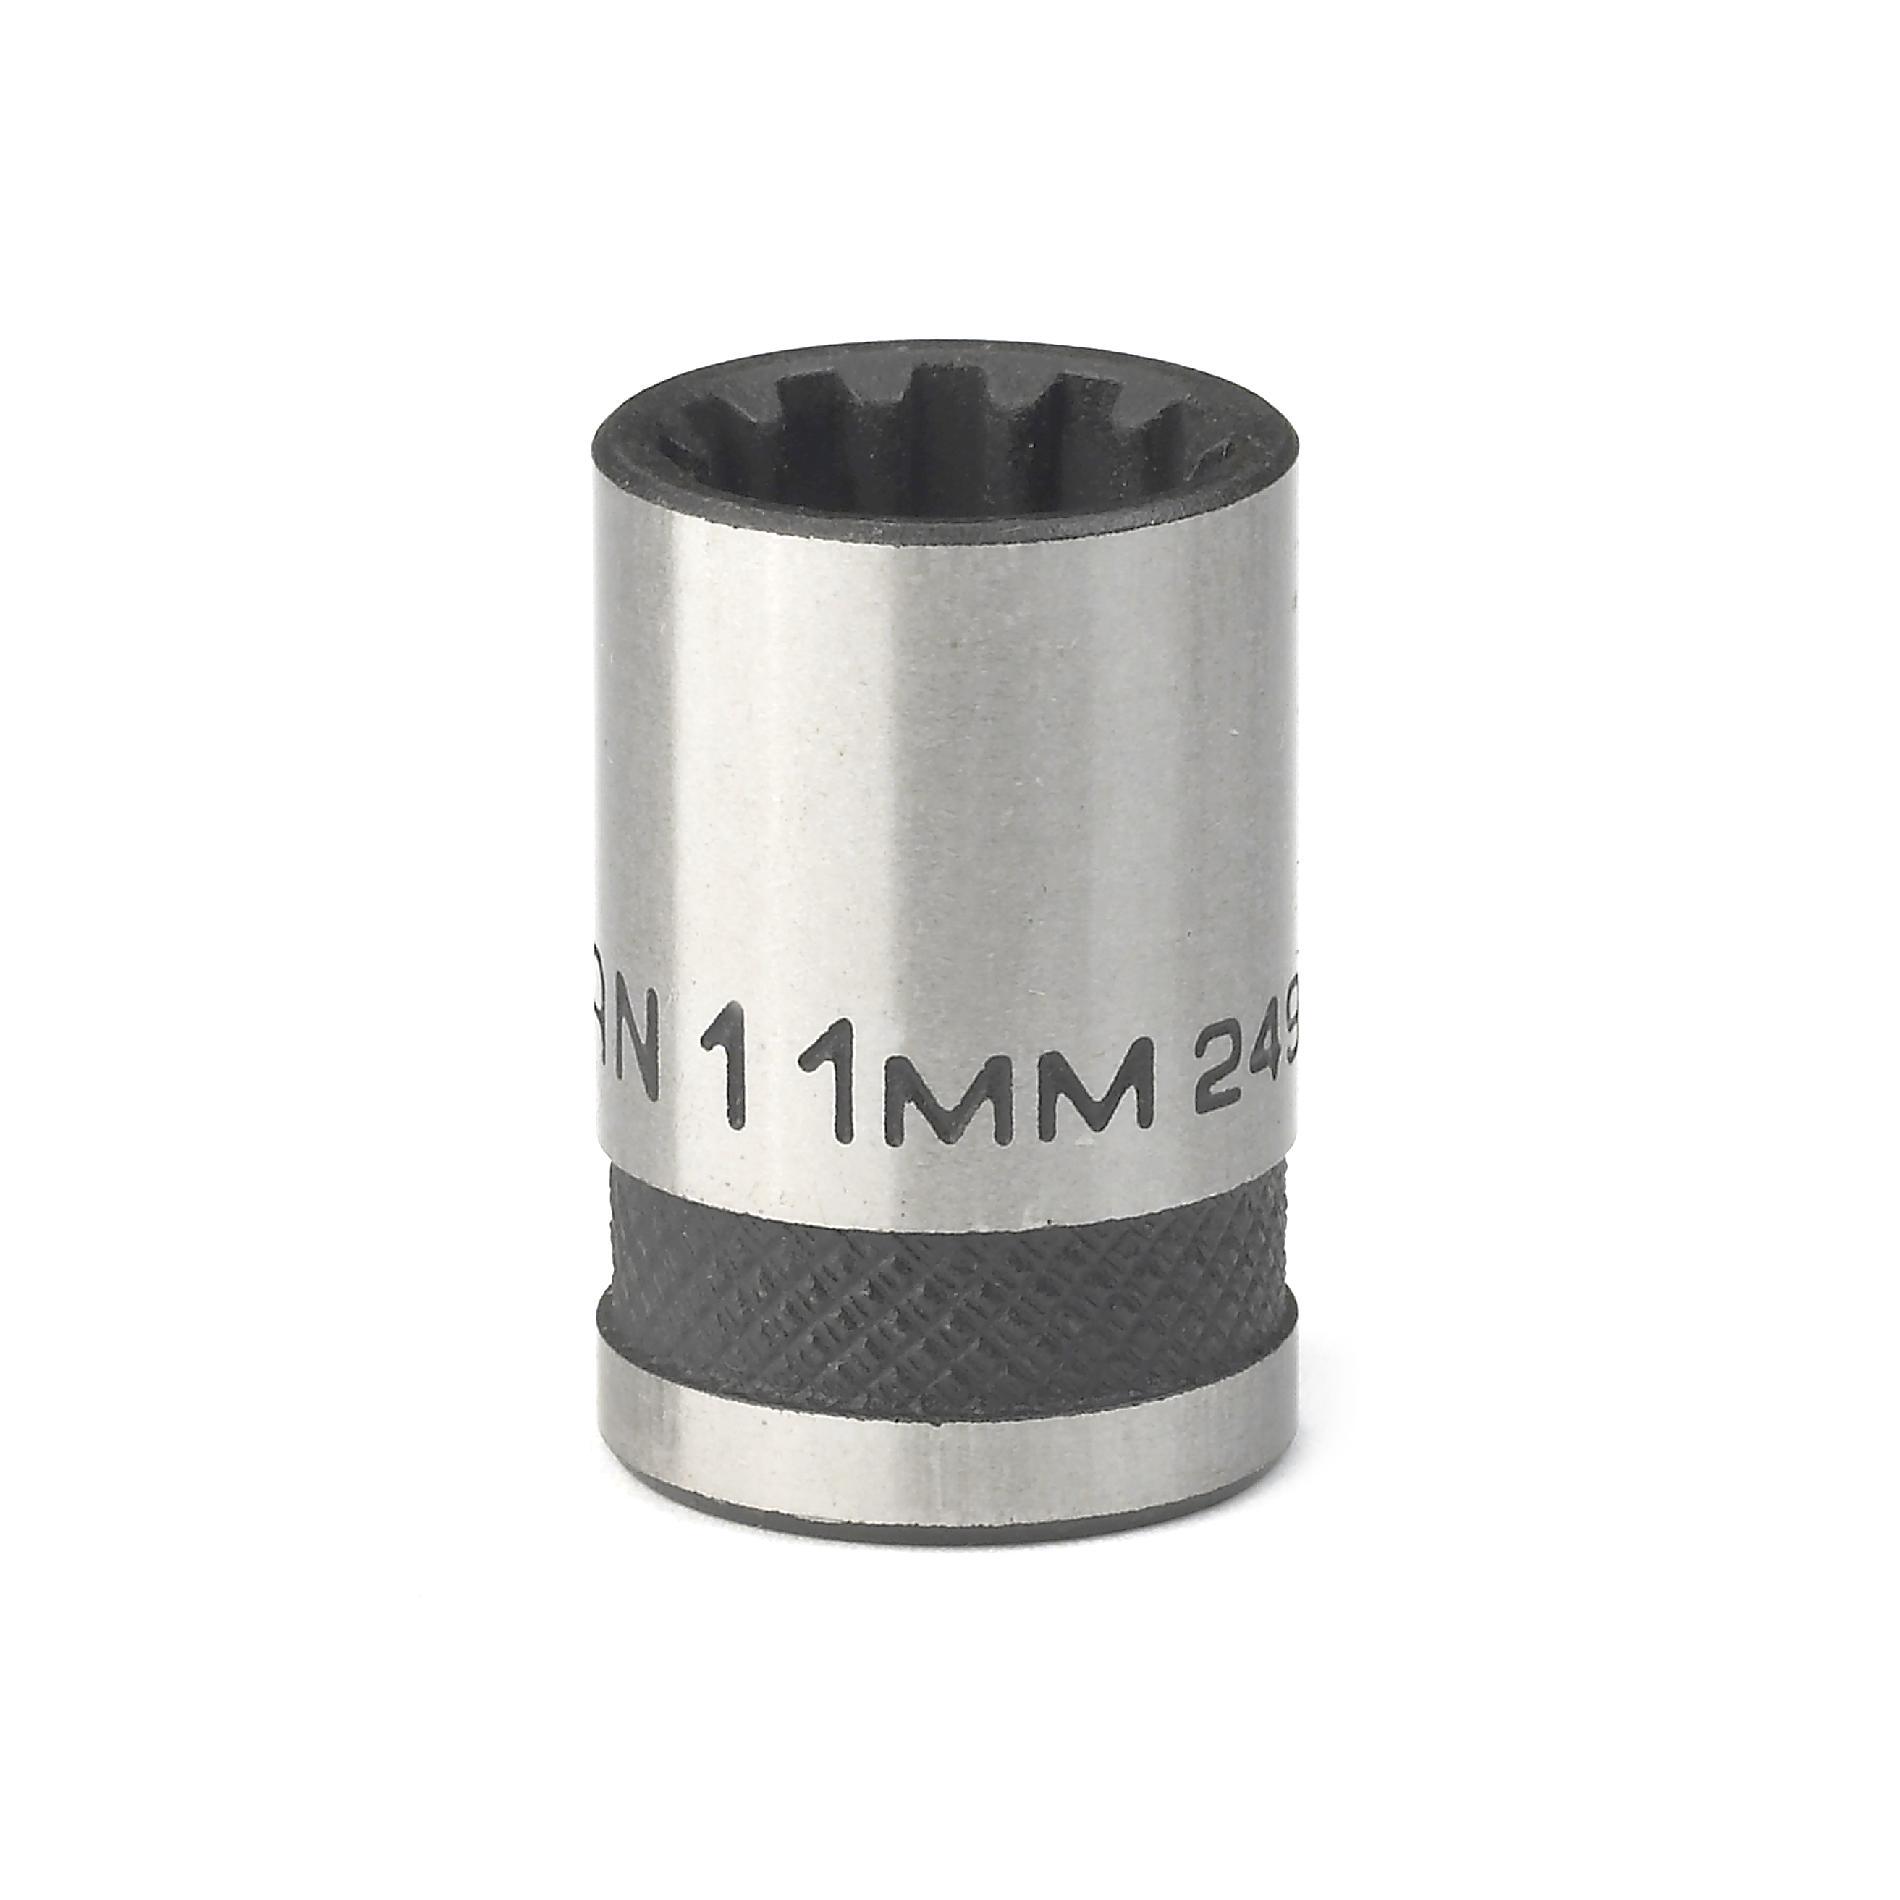 Craftsman Universal 11mm Socket, 3/8